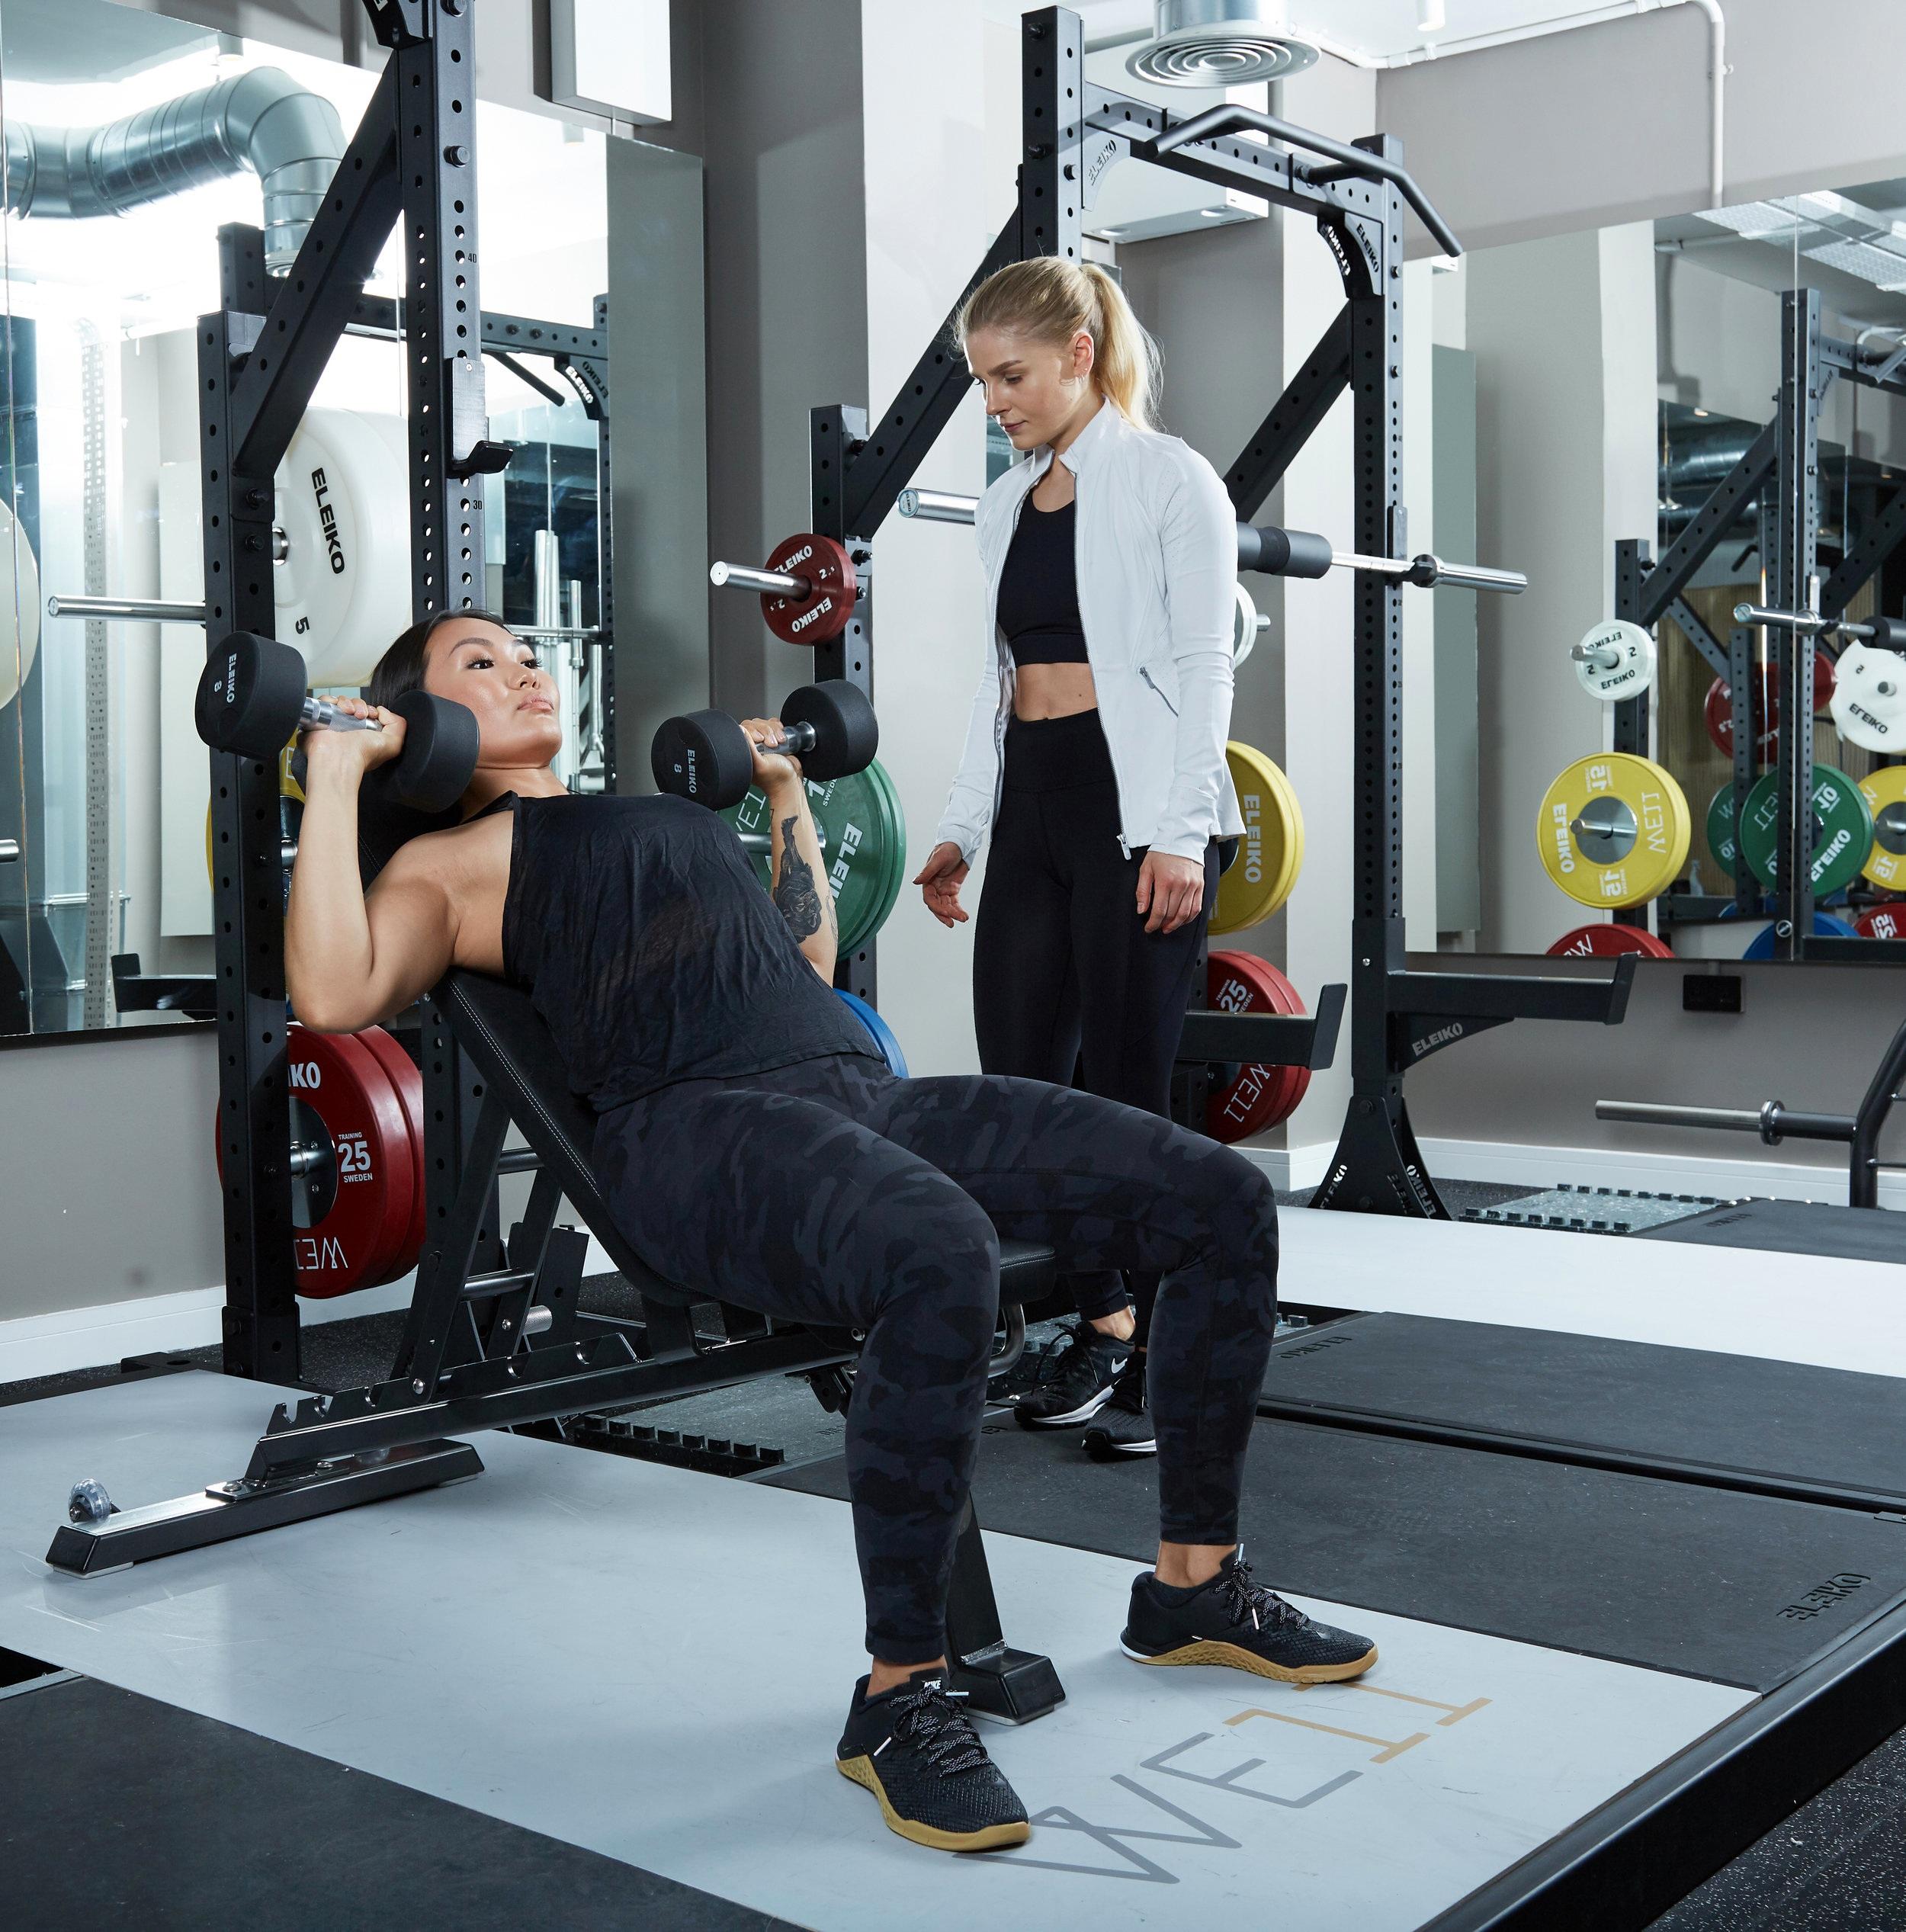 gym_session2062.jpg